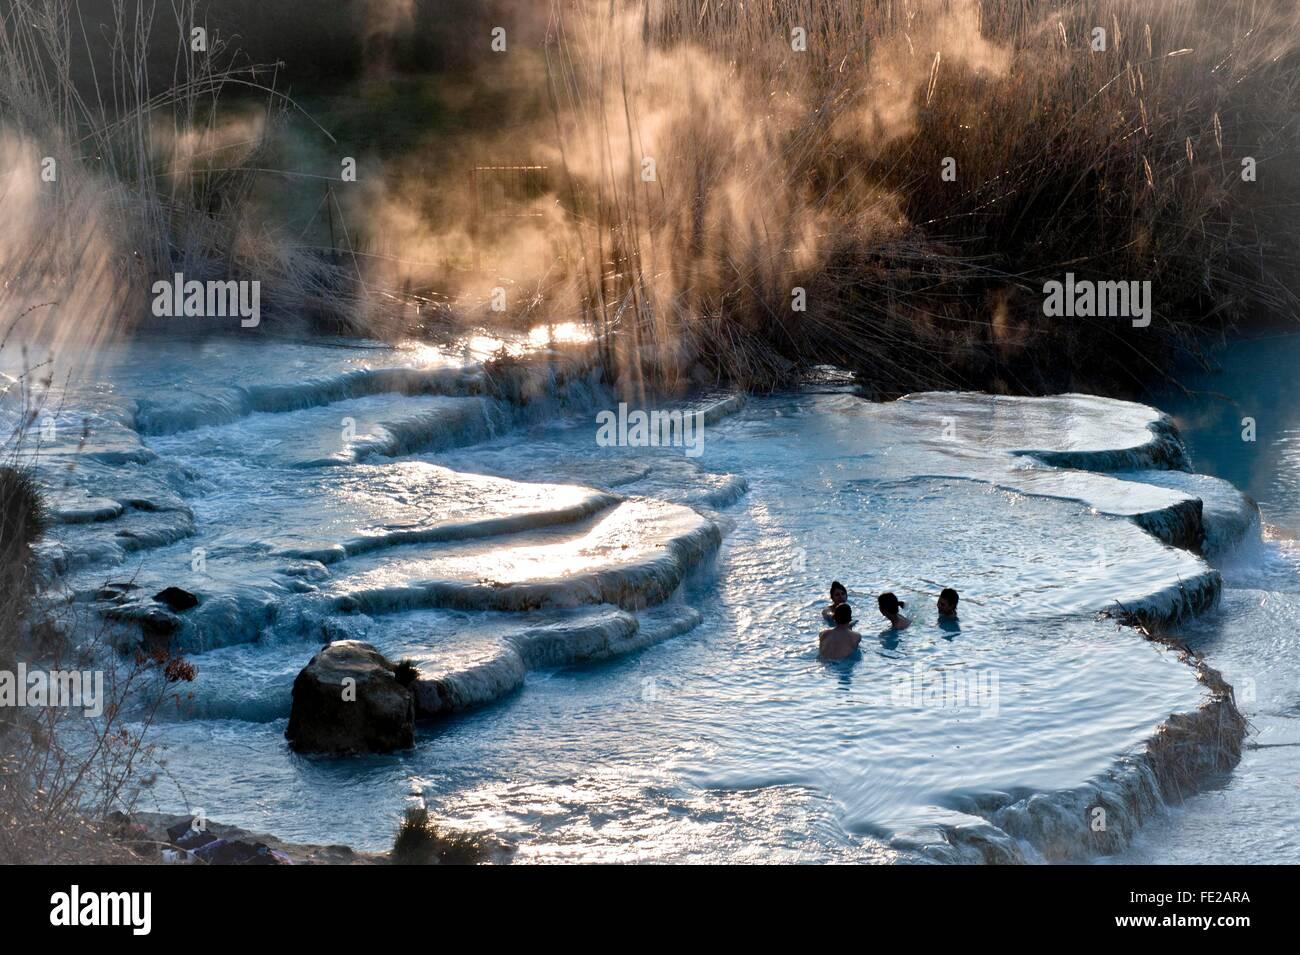 Saturnia thermal baths at dawn,  Saturnia, Grosseto province, Tuscany, Italy    Credit © Silvio Mencarelli/Sintesi/Alamy - Stock Image